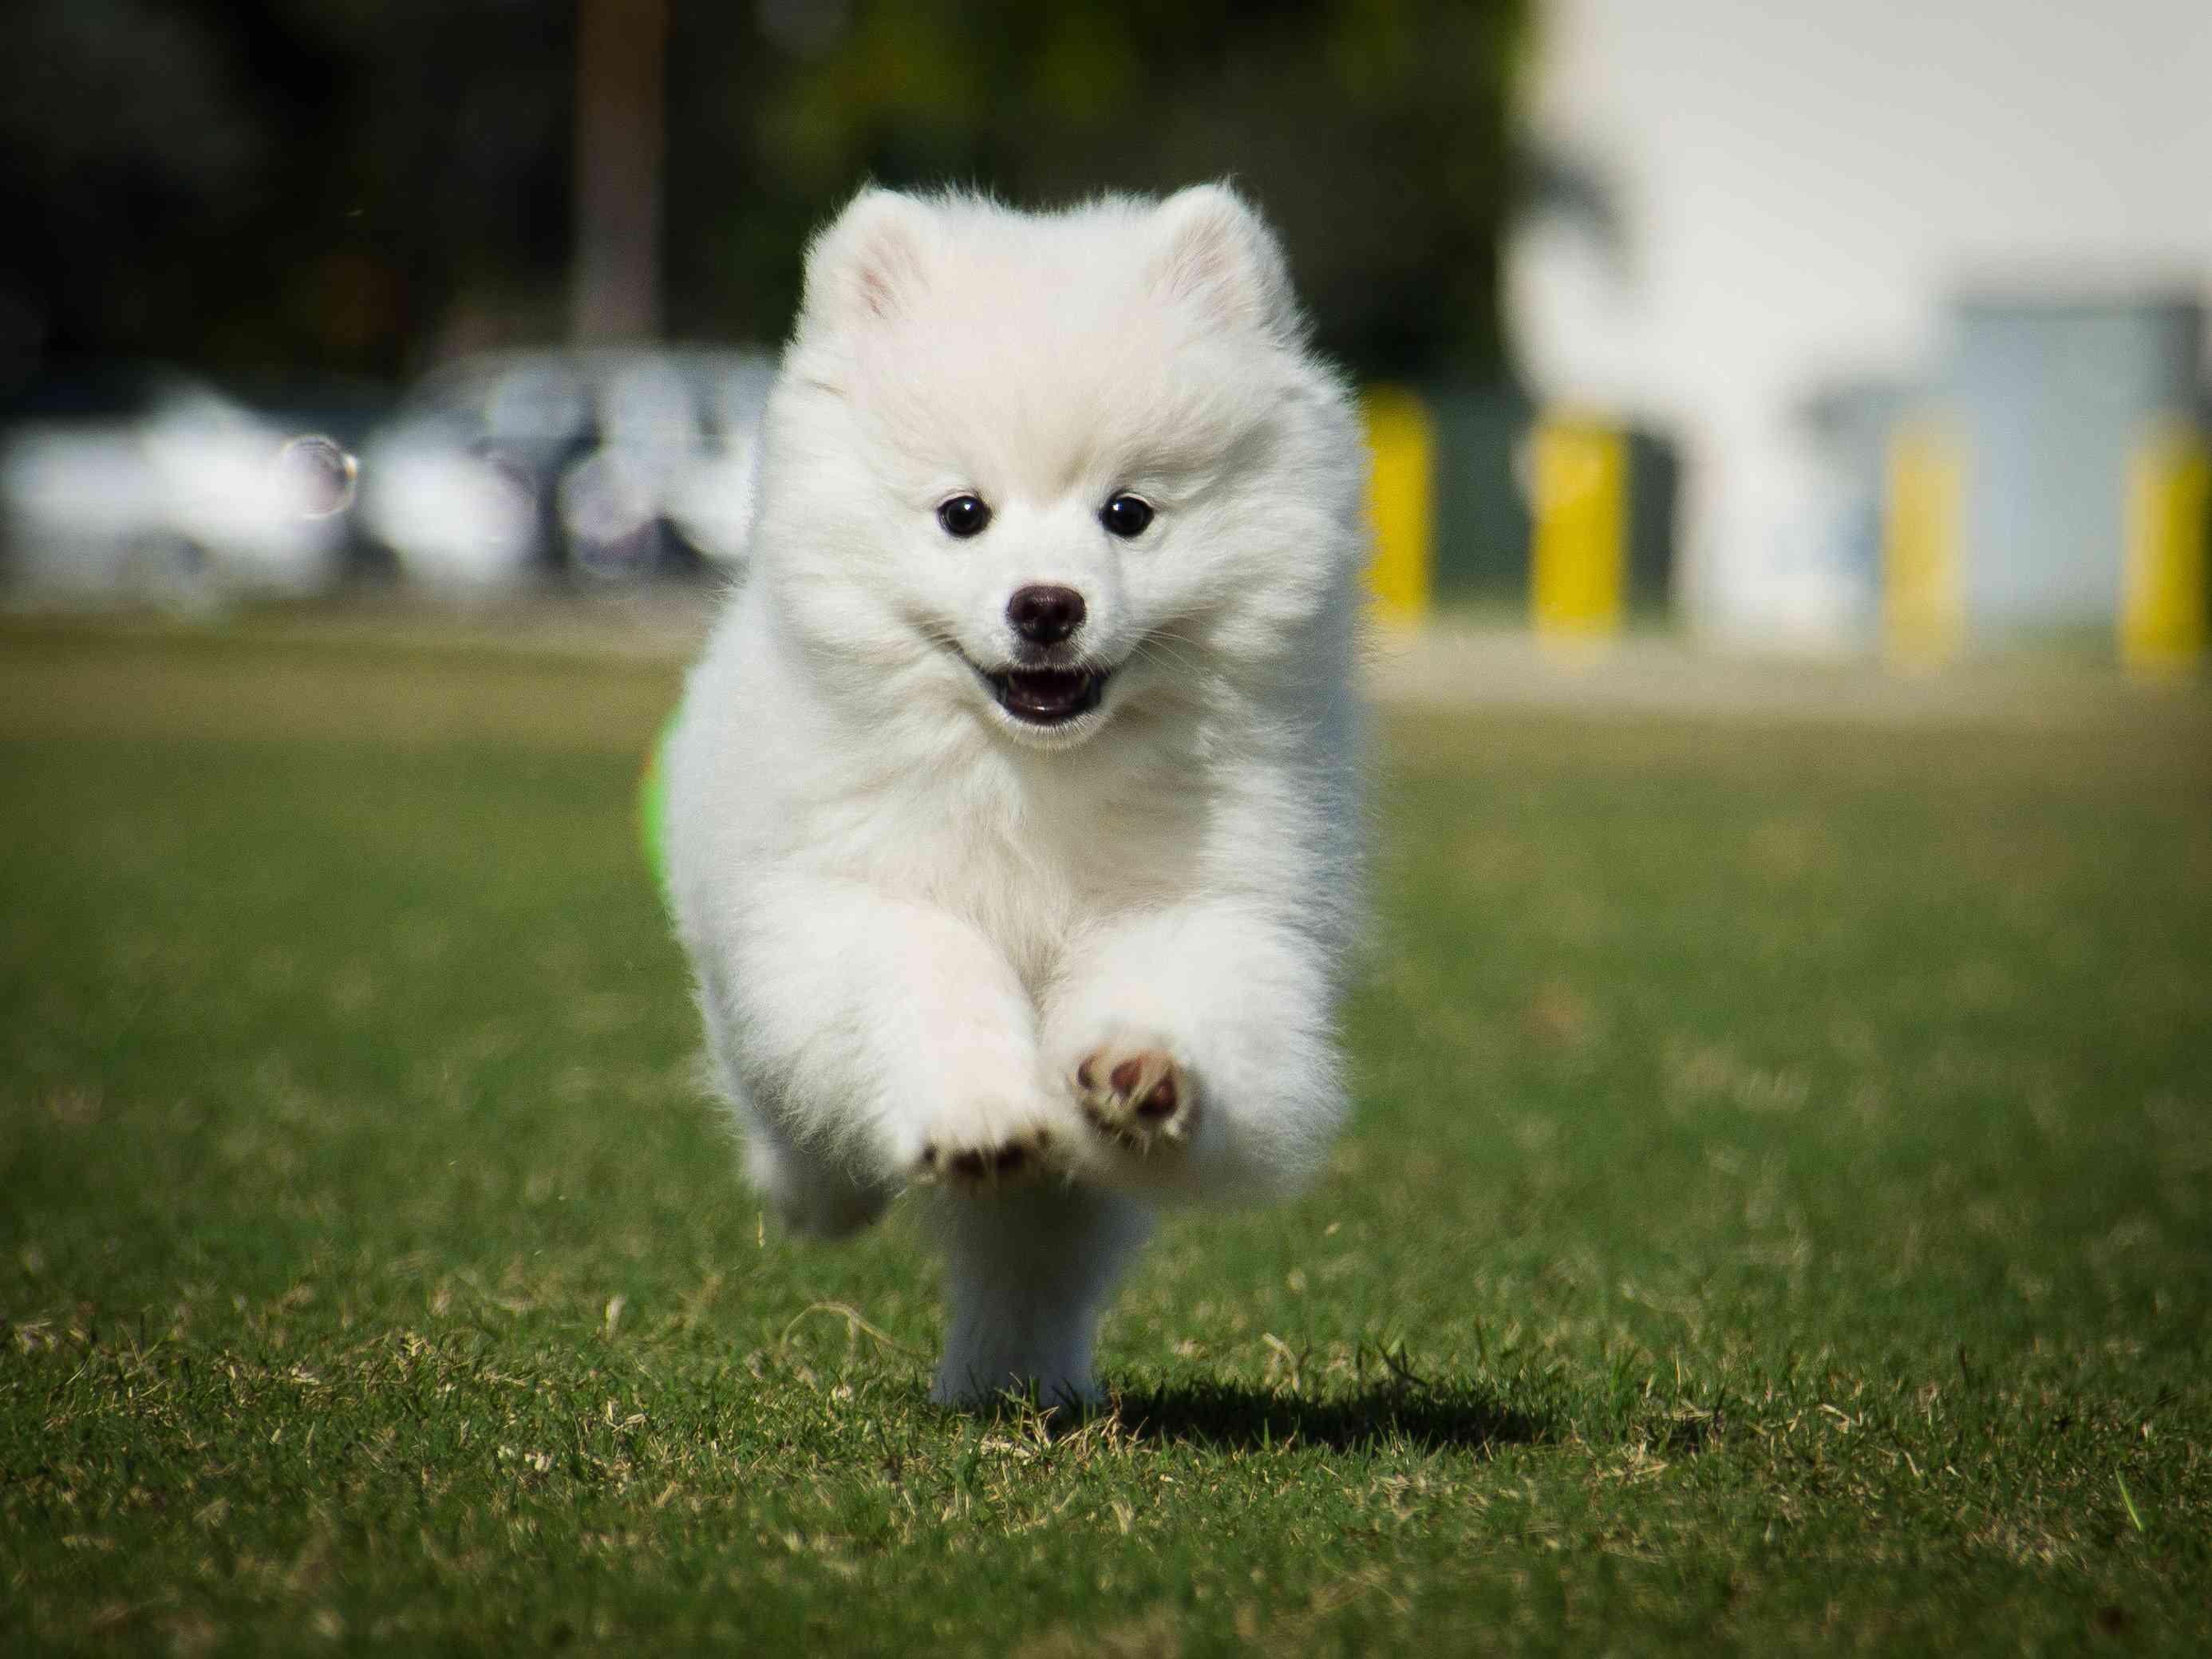 American Eskimo dog running on grass